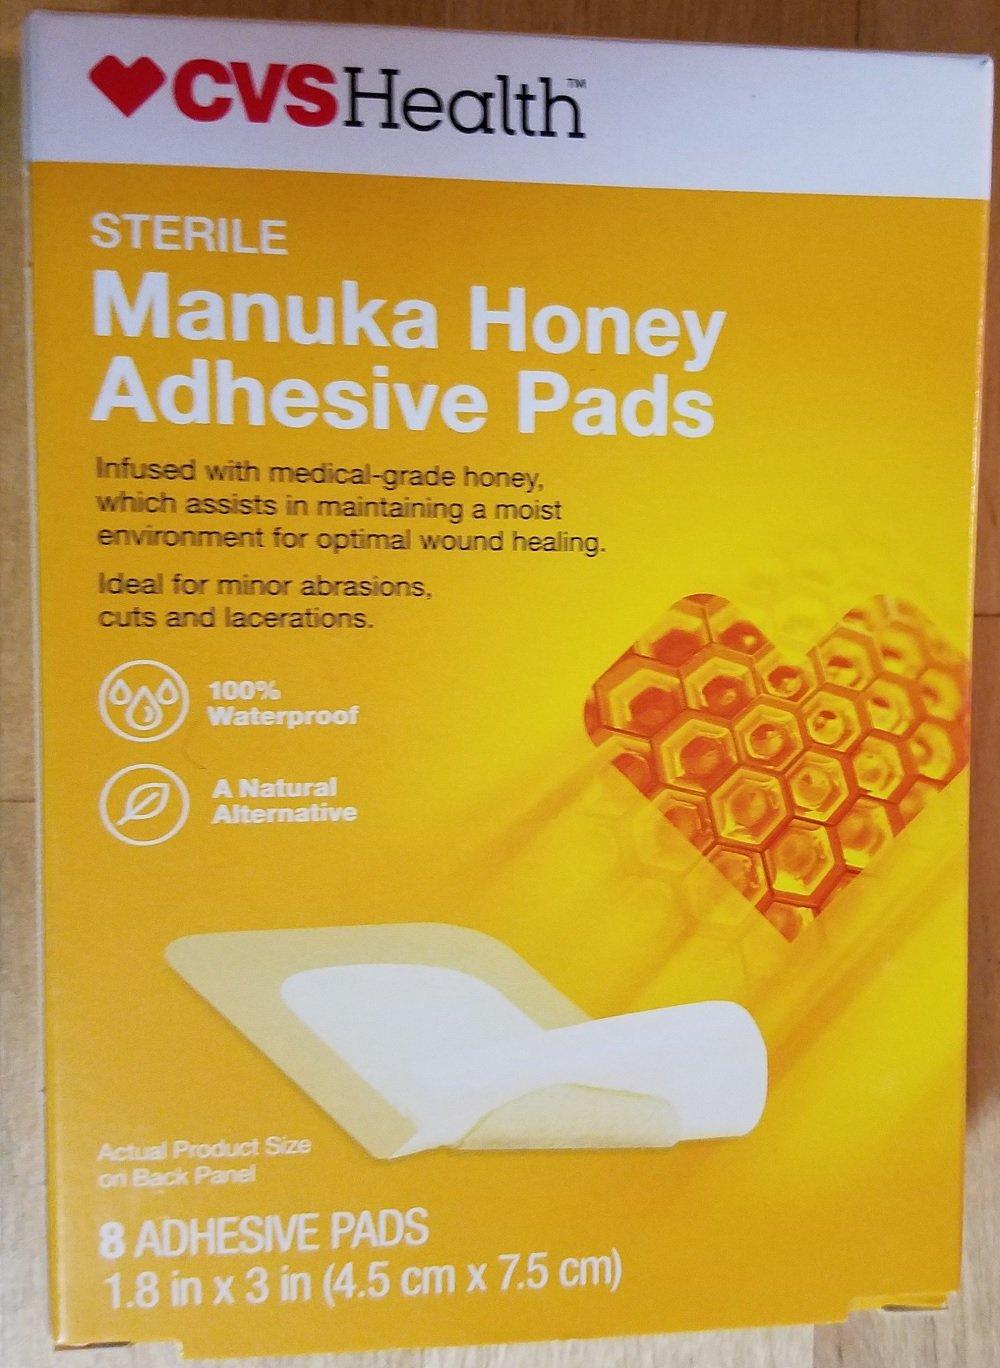 CVS Manuka Honey Adhesive Pads 1.8'' x 3'' 8 Count by CVS